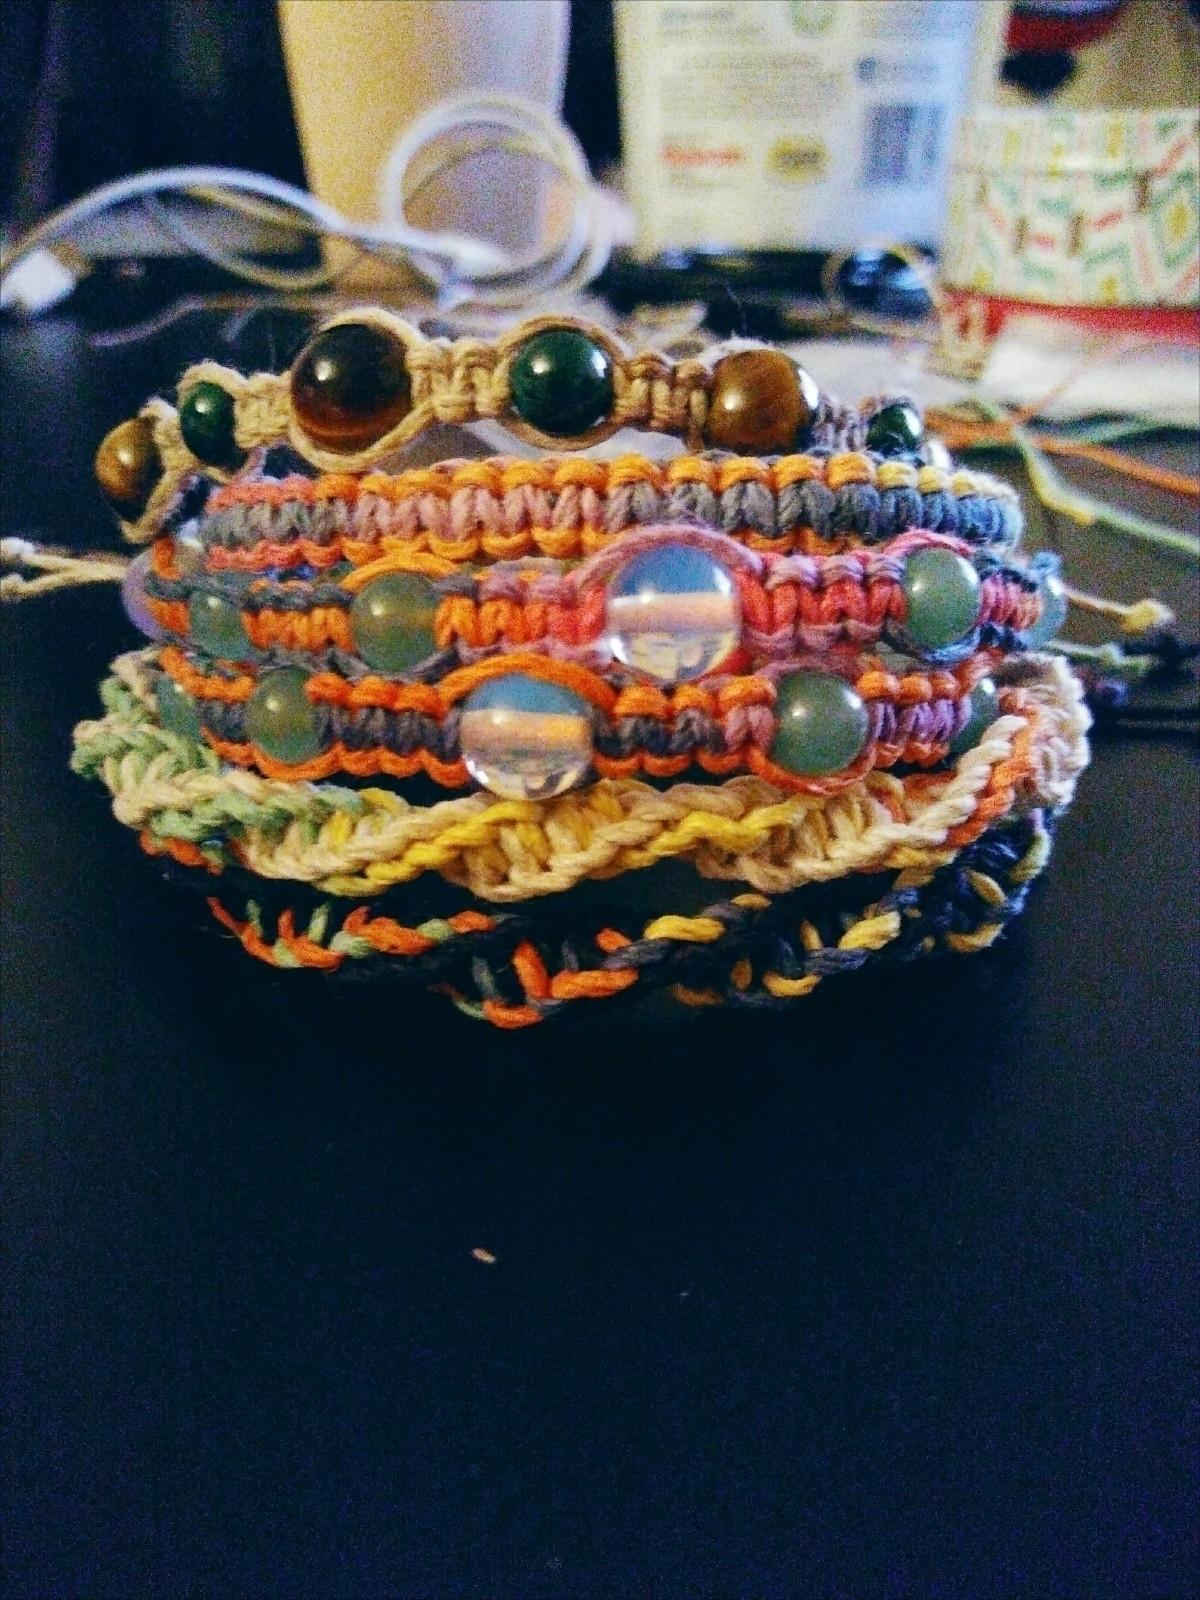 working lot rainbow bracelets P - craftywitch | ello